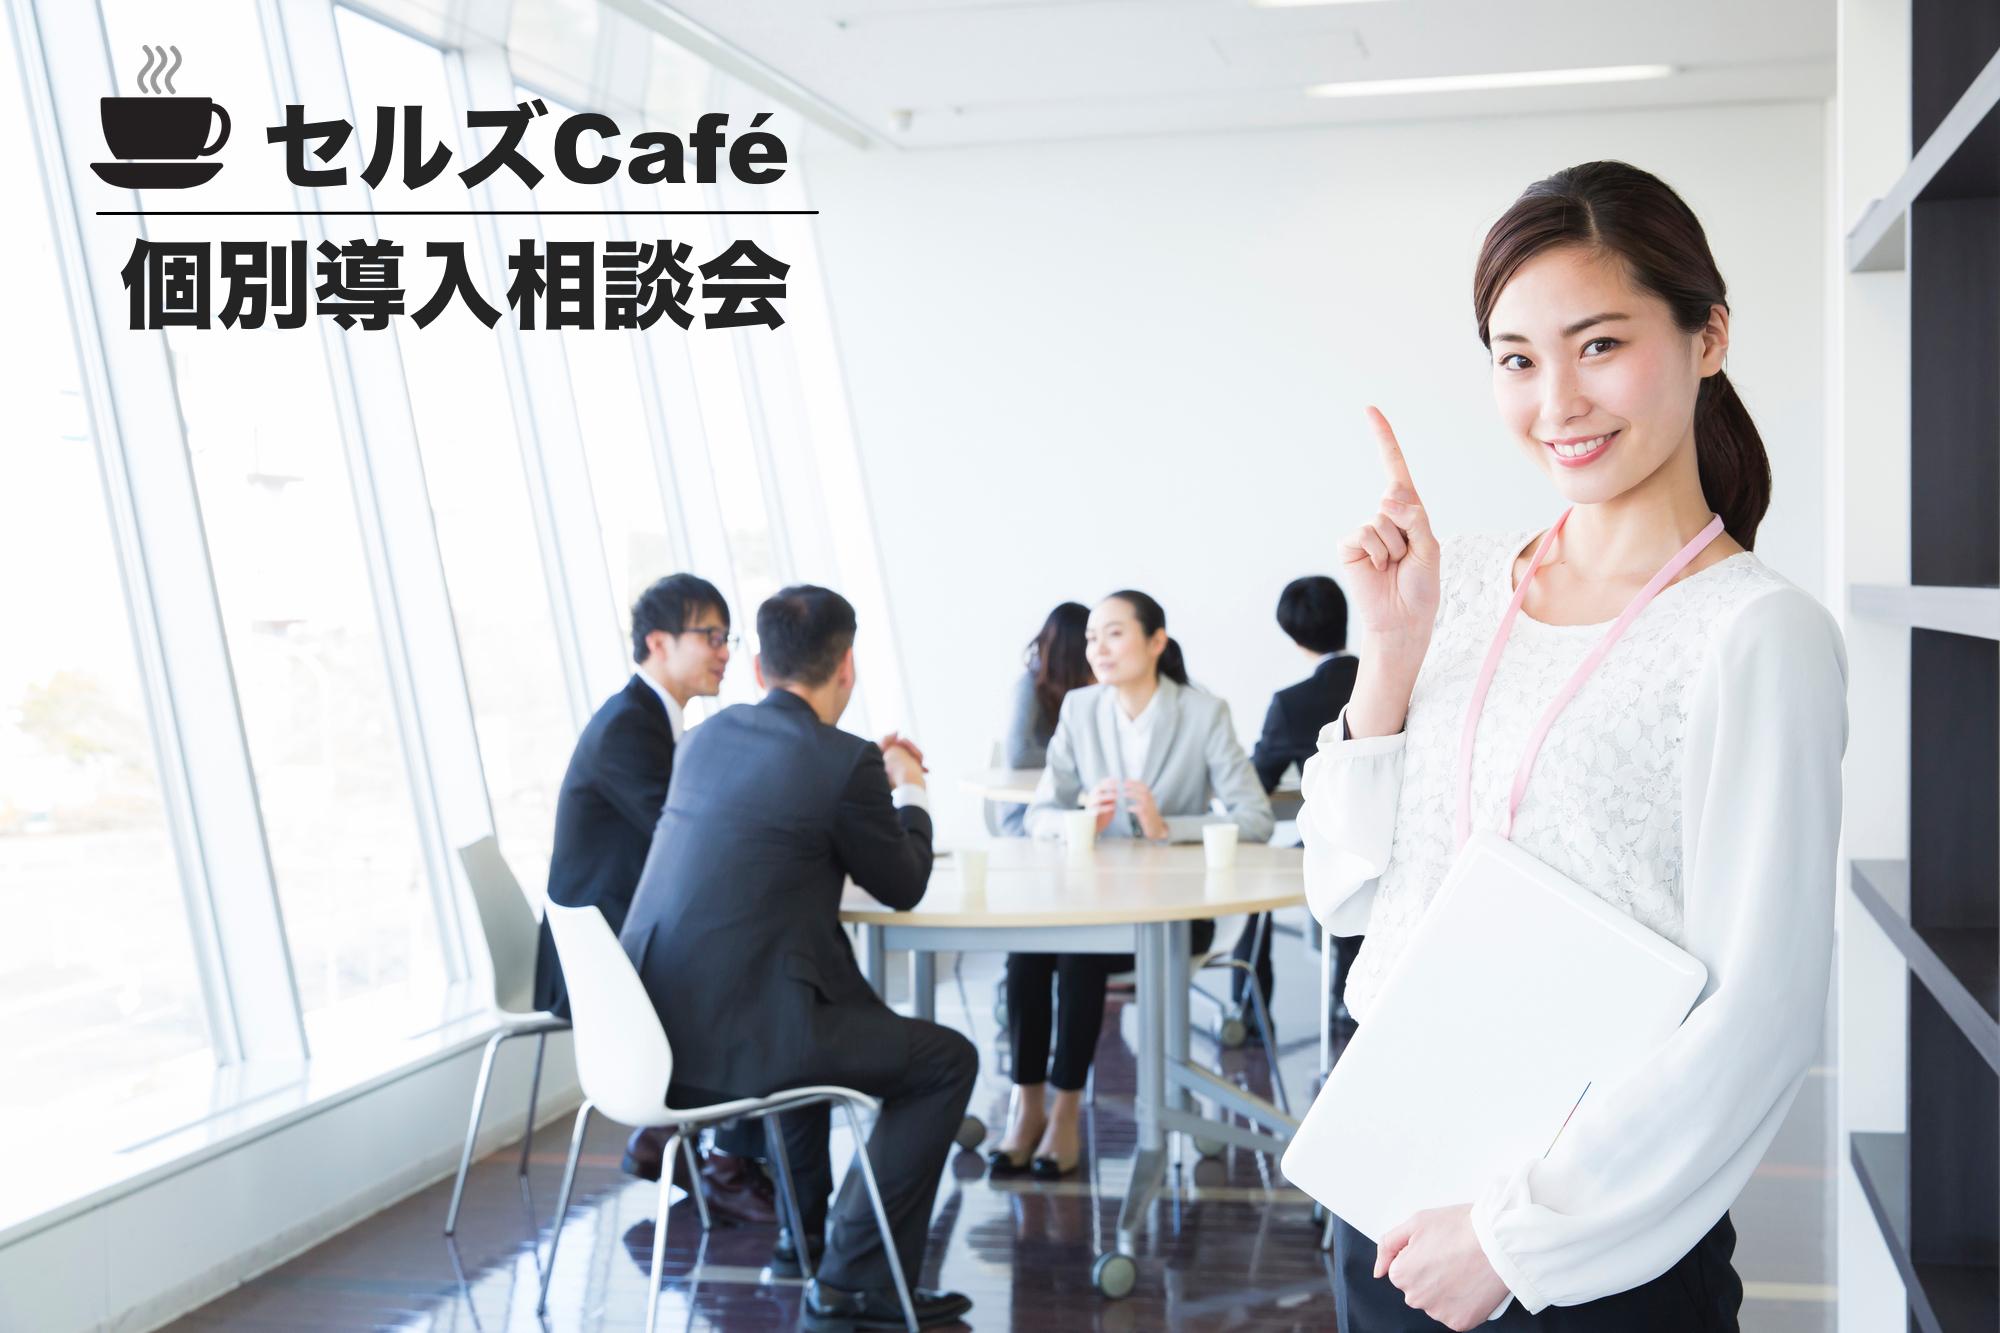 【10月より再開!】セルズ Café | 台帳活用座談会 【品川店 / 名古屋伏見店】